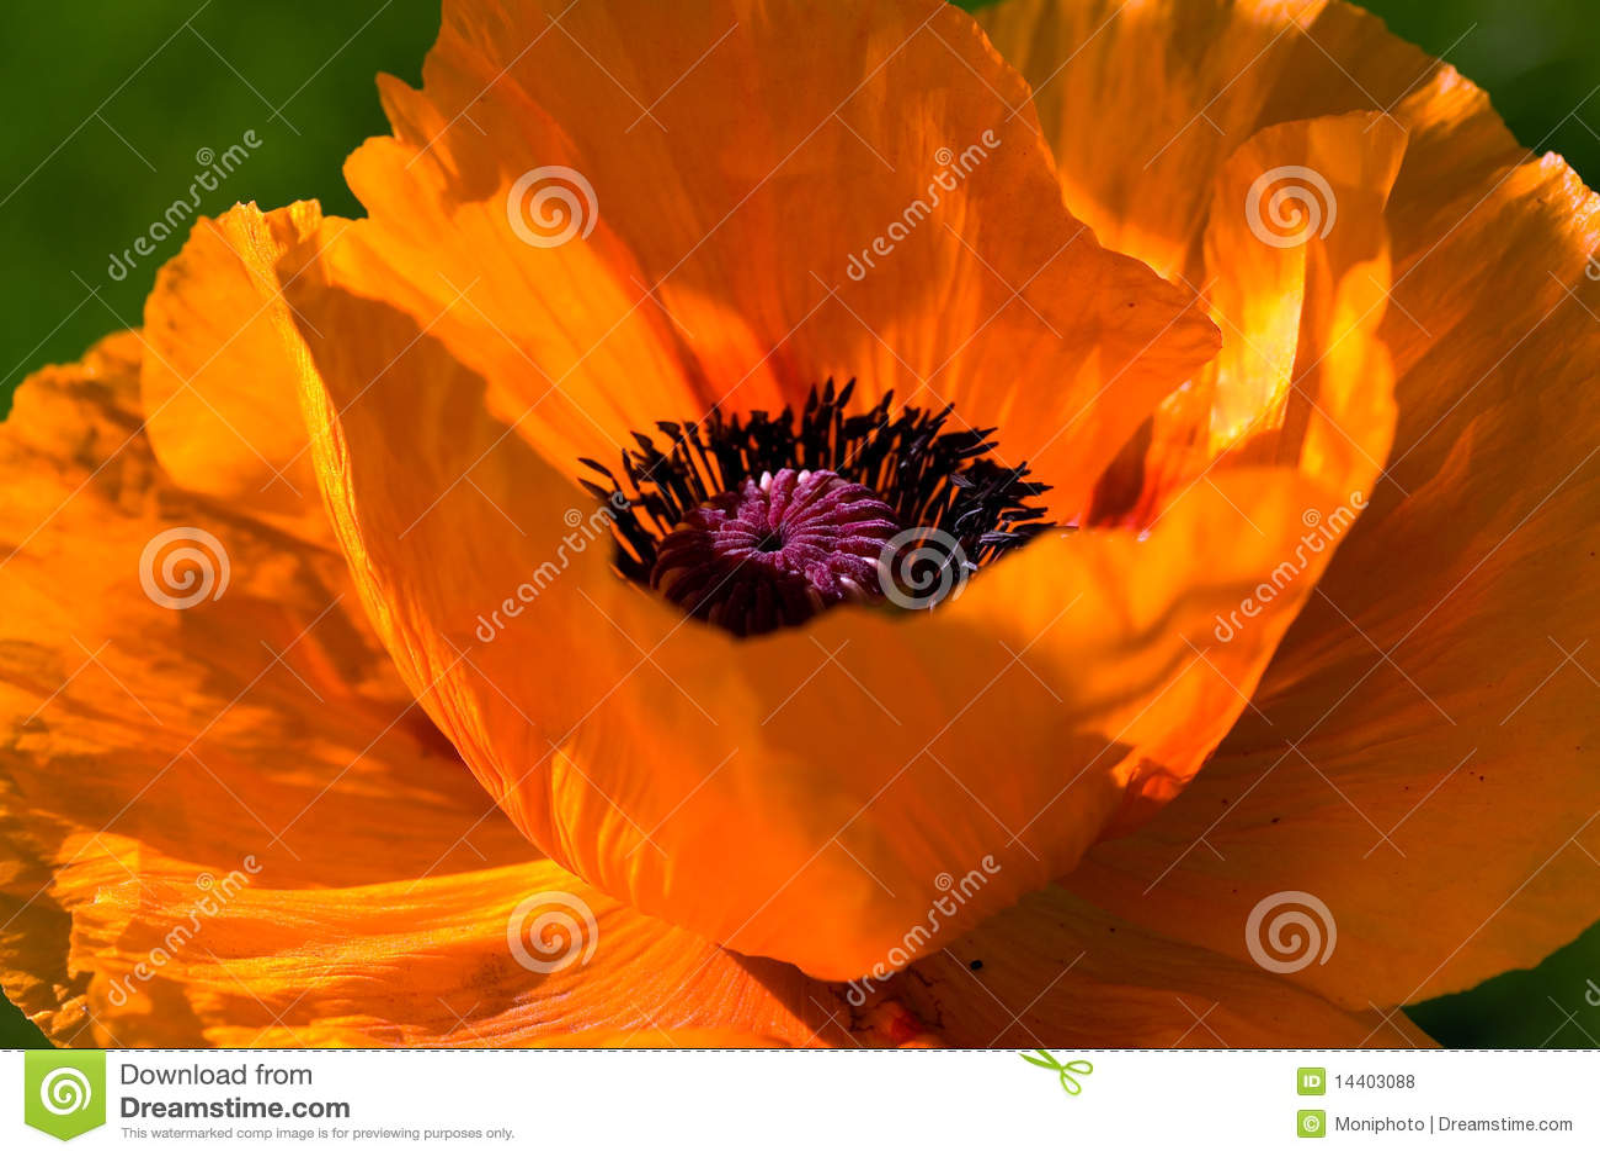 Beautiful Big Orange Poppy Flower Stock Photo Image Of Memory